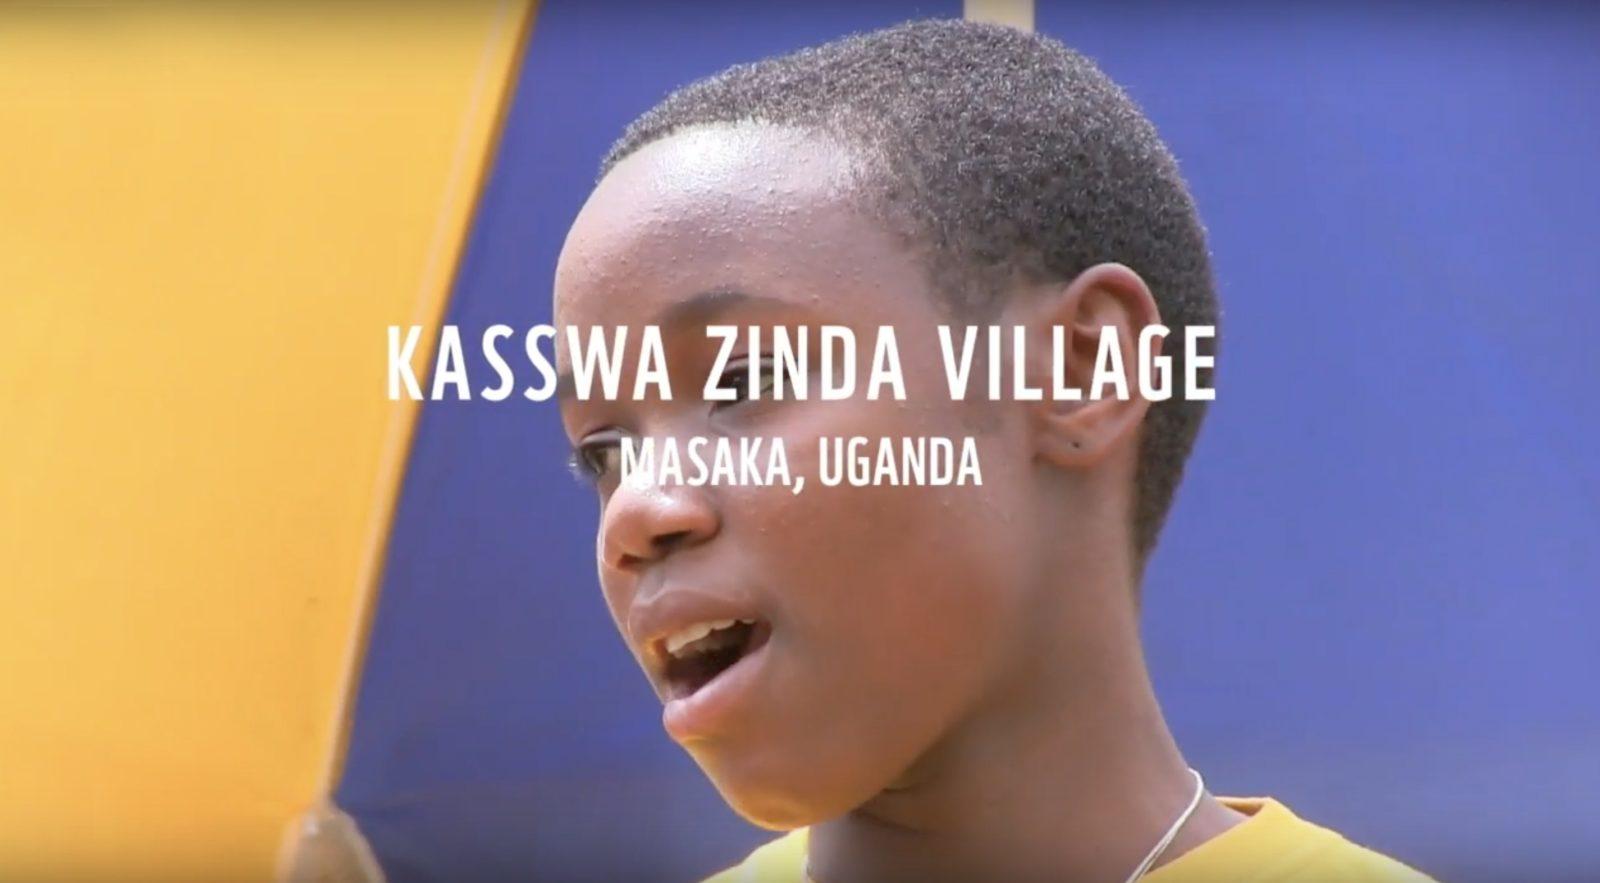 Kasswa Zinda Village